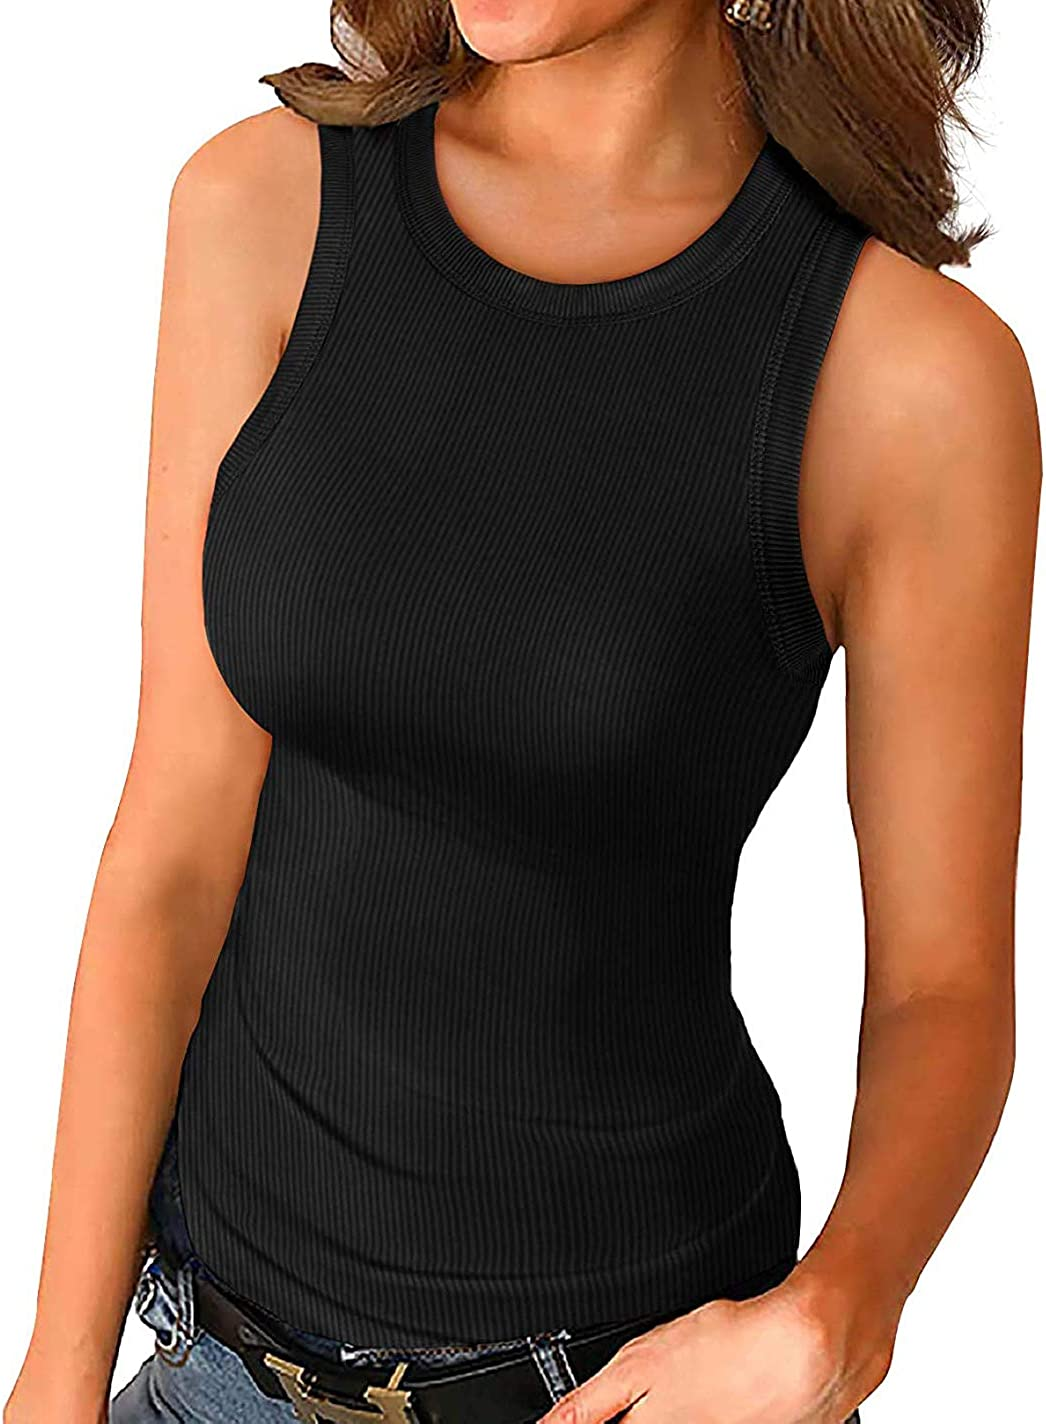 Women Tank Tops Summer Ribbed Basic Cami Top Sleeveless Shirt Slim Knit Racerback Blouses